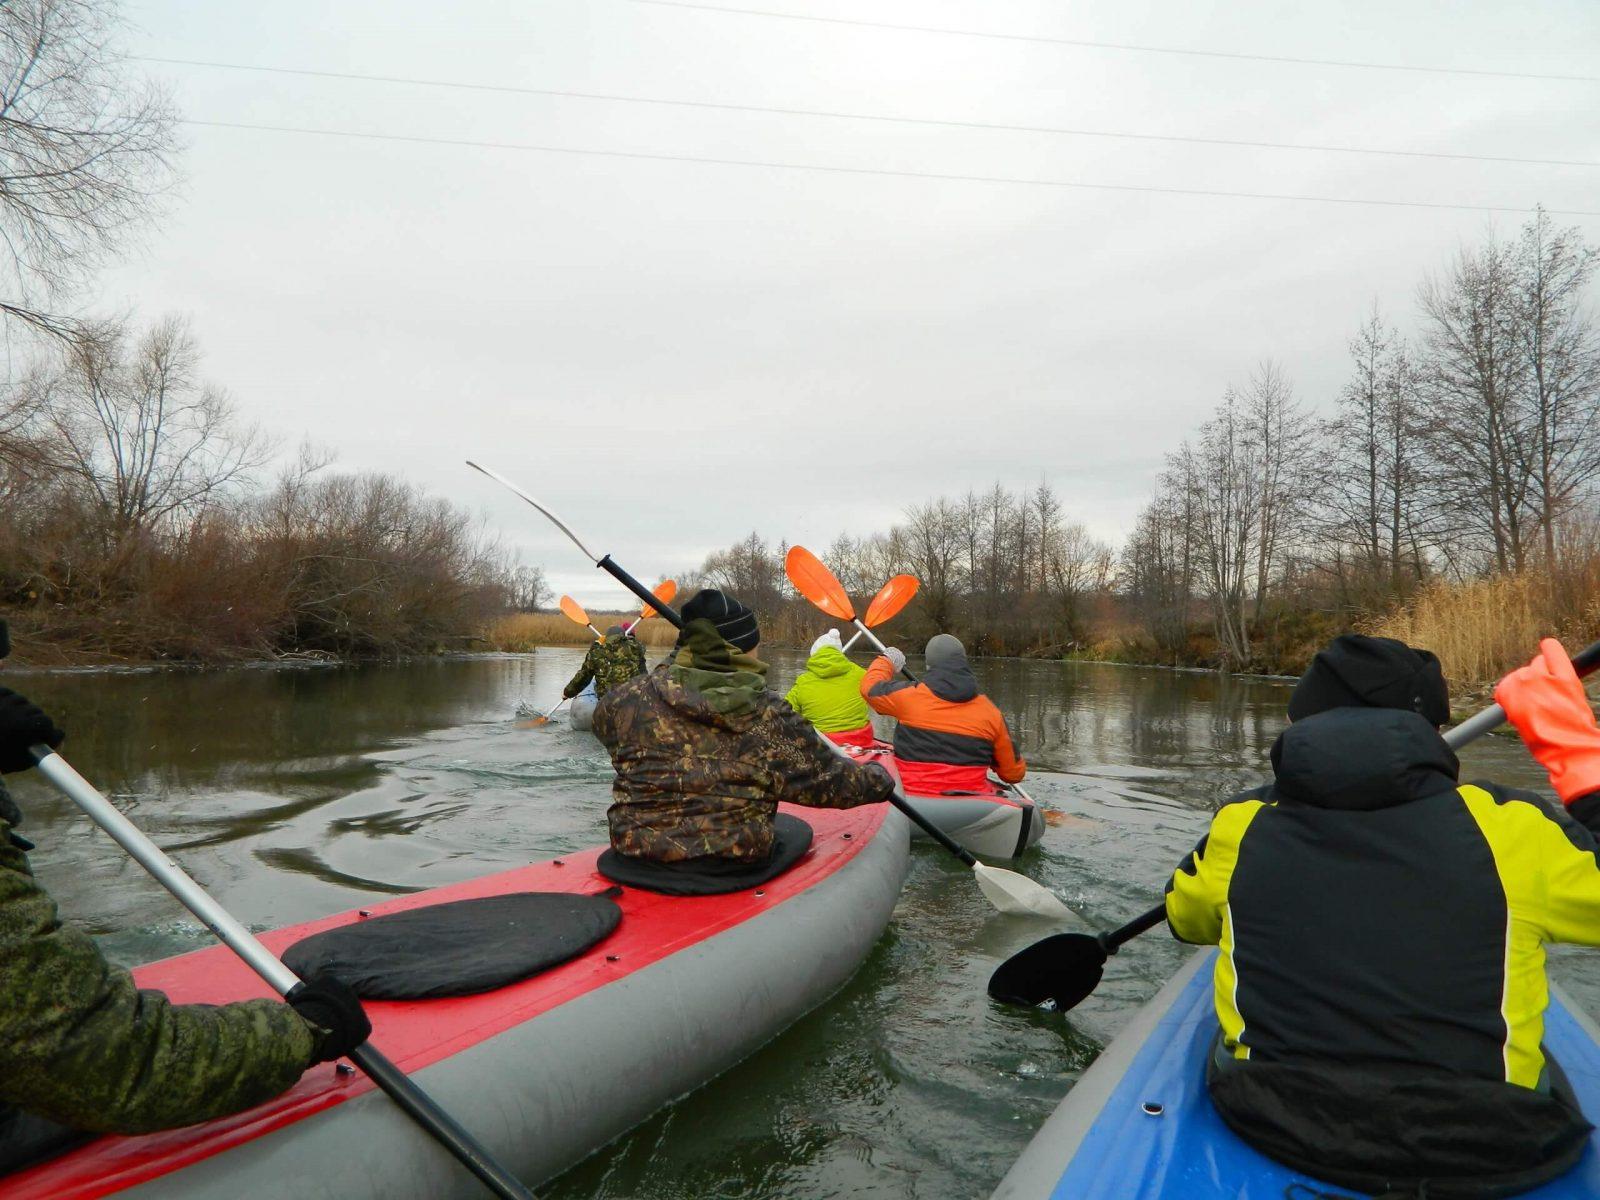 Фото проведения корпоративного сплава по реке от RedG